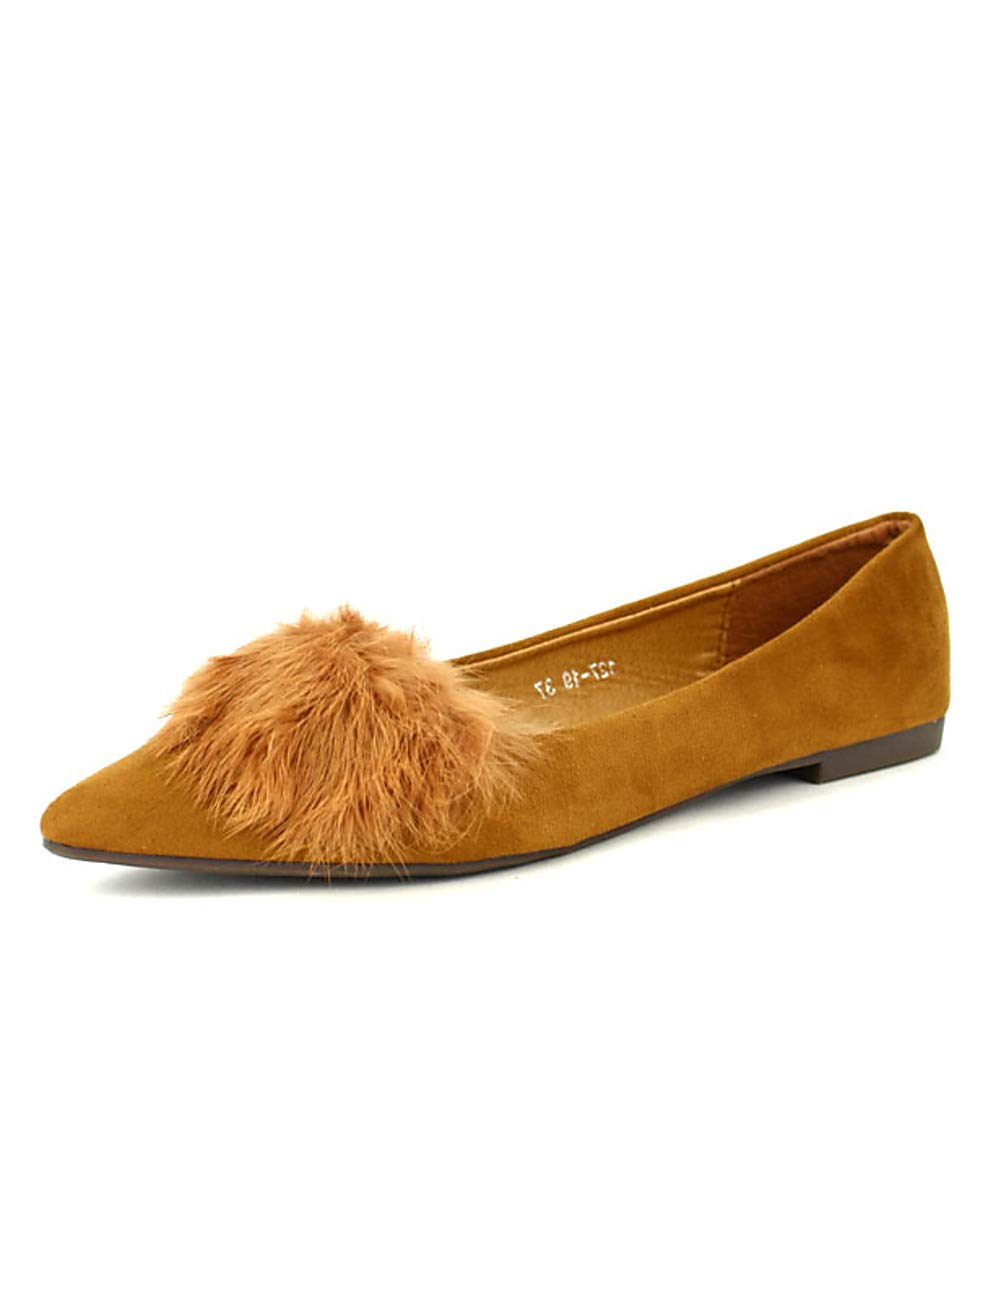 Cendriyon, B06XJ3YMC8 MULANKA Ballerines Caramel MULANKA Fourrure Chaussures Femme Chaussures Caramel 0a5ed08 - conorscully.space